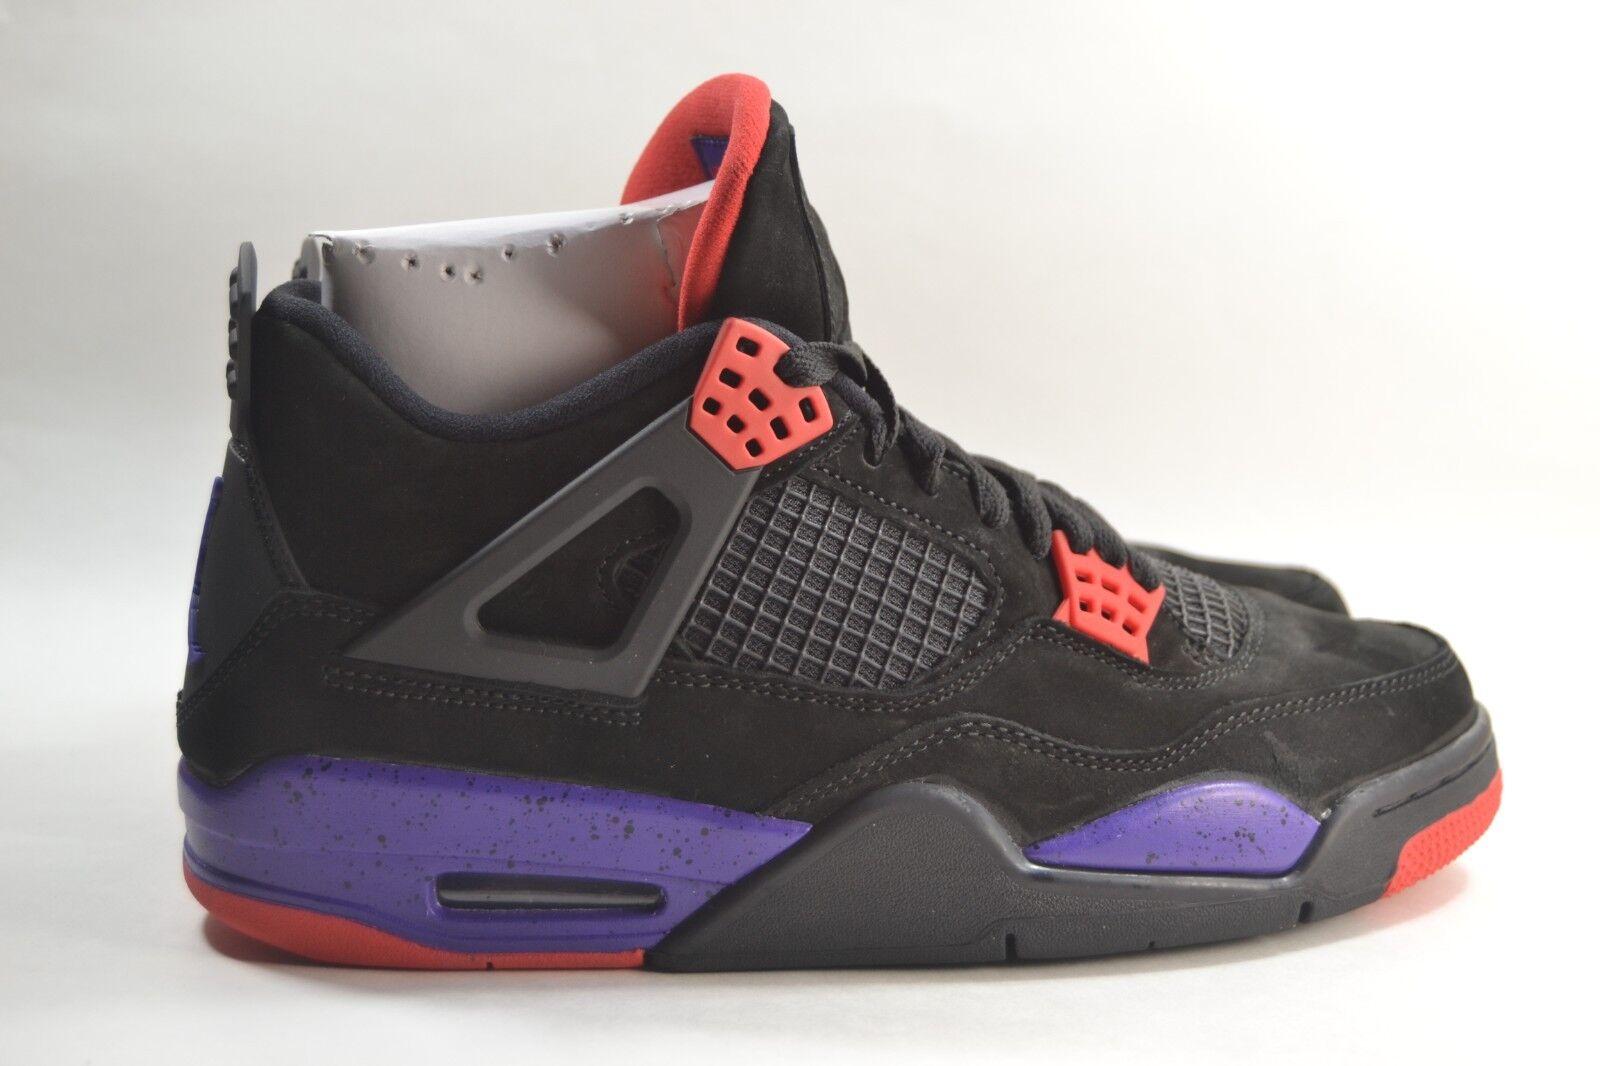 New Mens Nike Air Jordan Retro 4 IV NRG Raptors Black Purple AQ3816-065